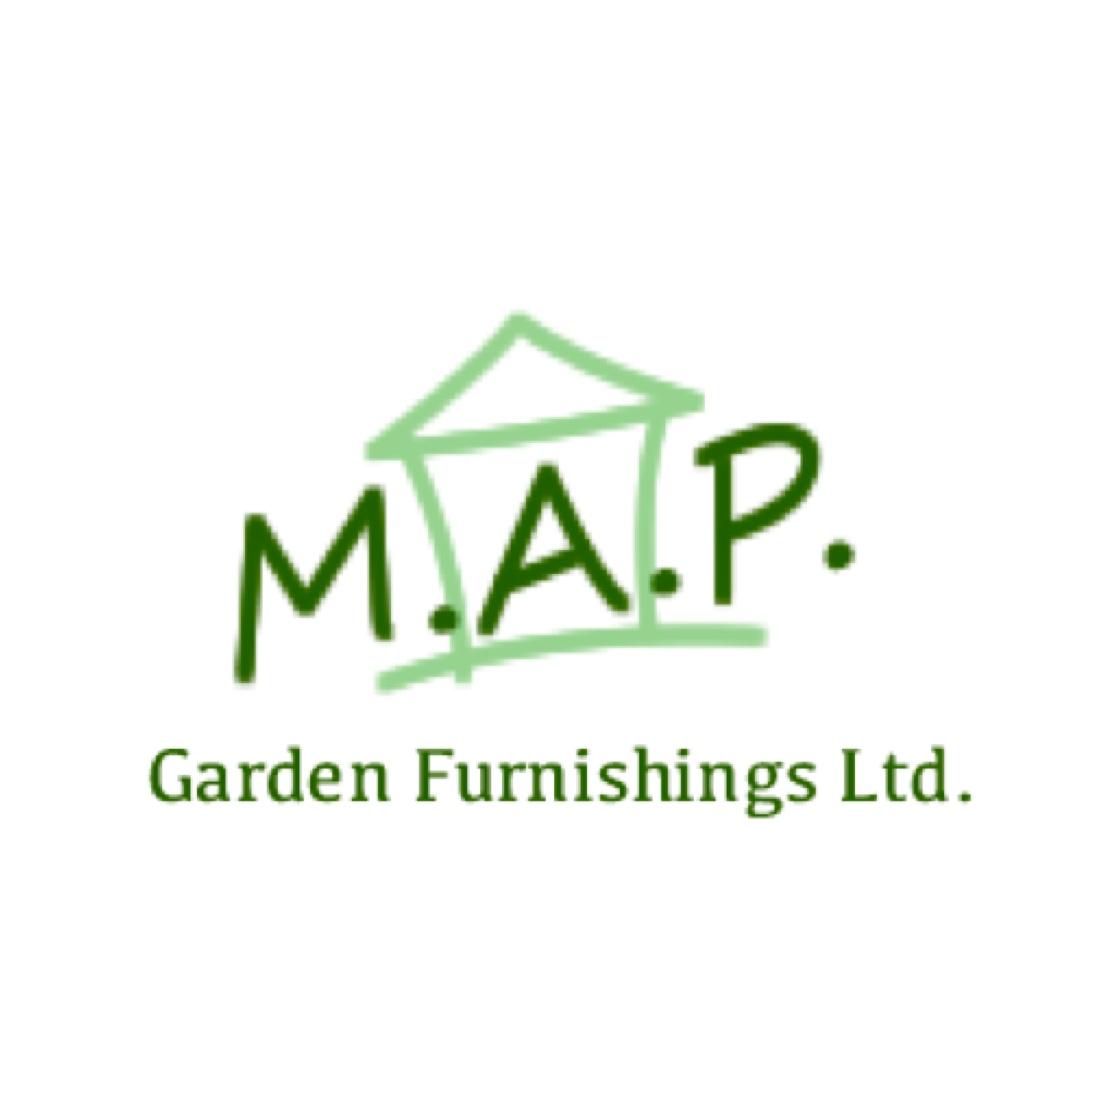 Shire Tunstall Pine Lodge 70mm